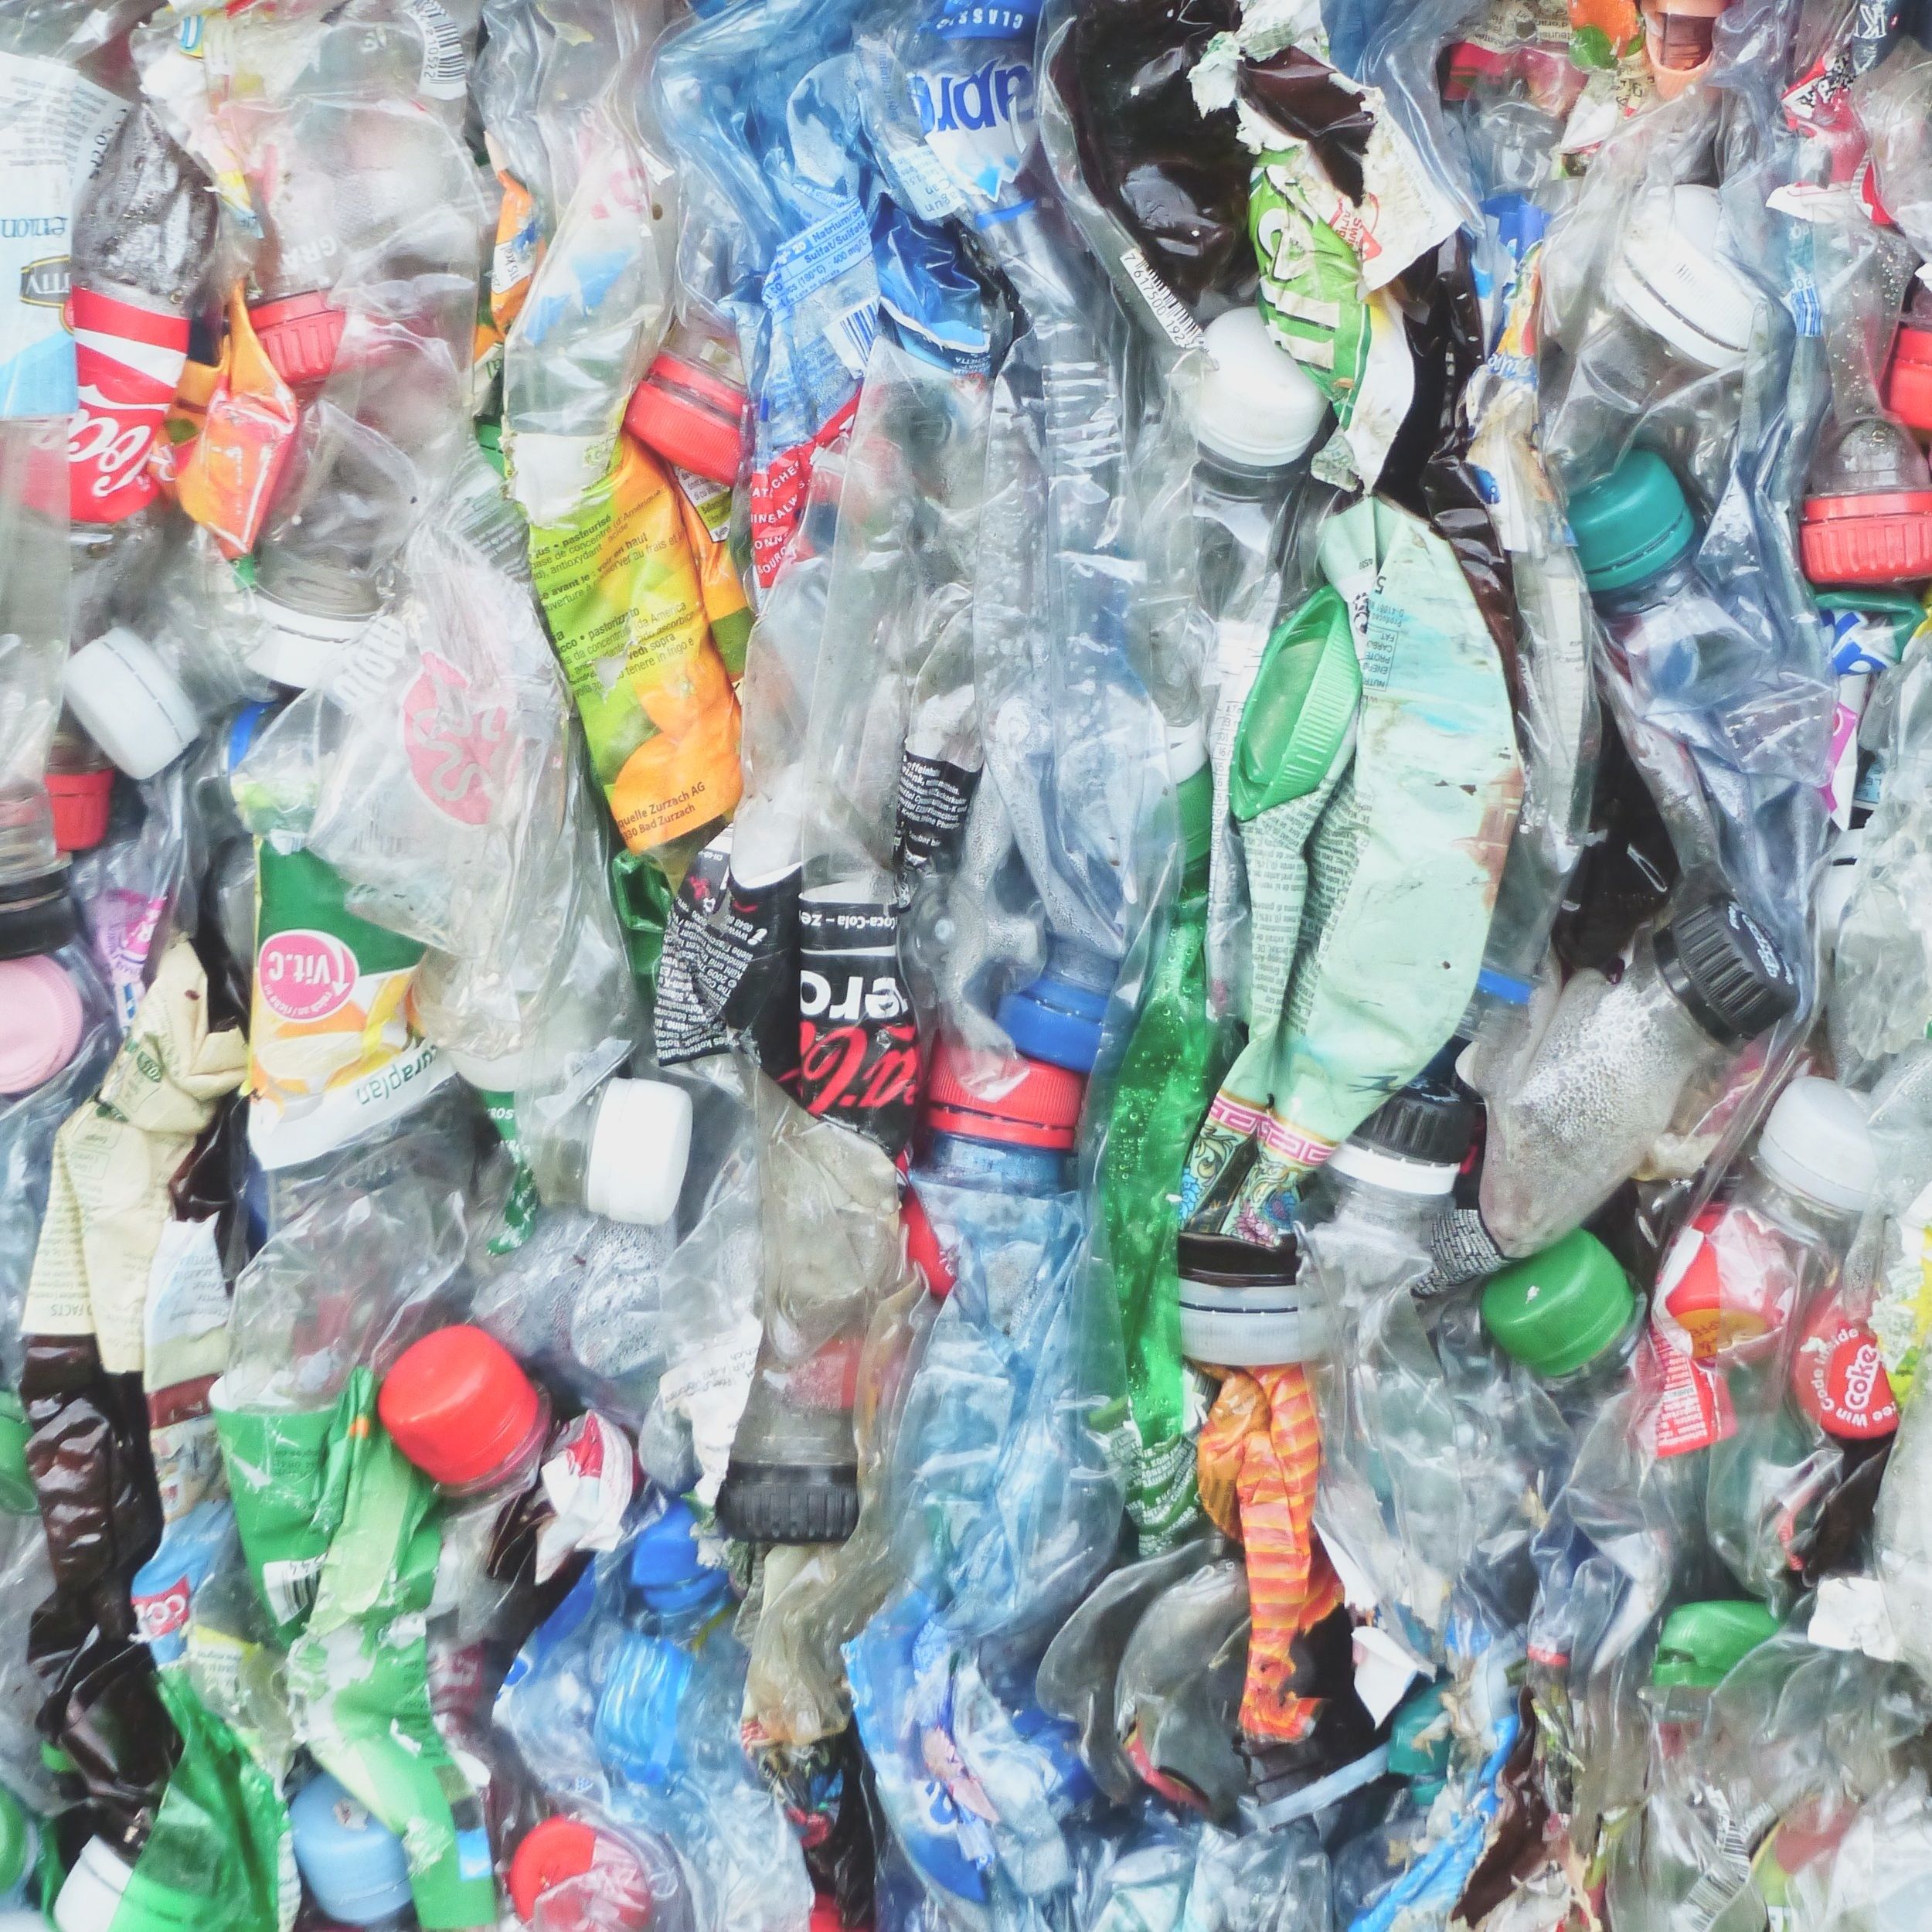 plastic-pet-bottles-waste-cube-garbage-1125470-pxhere.com.jpg